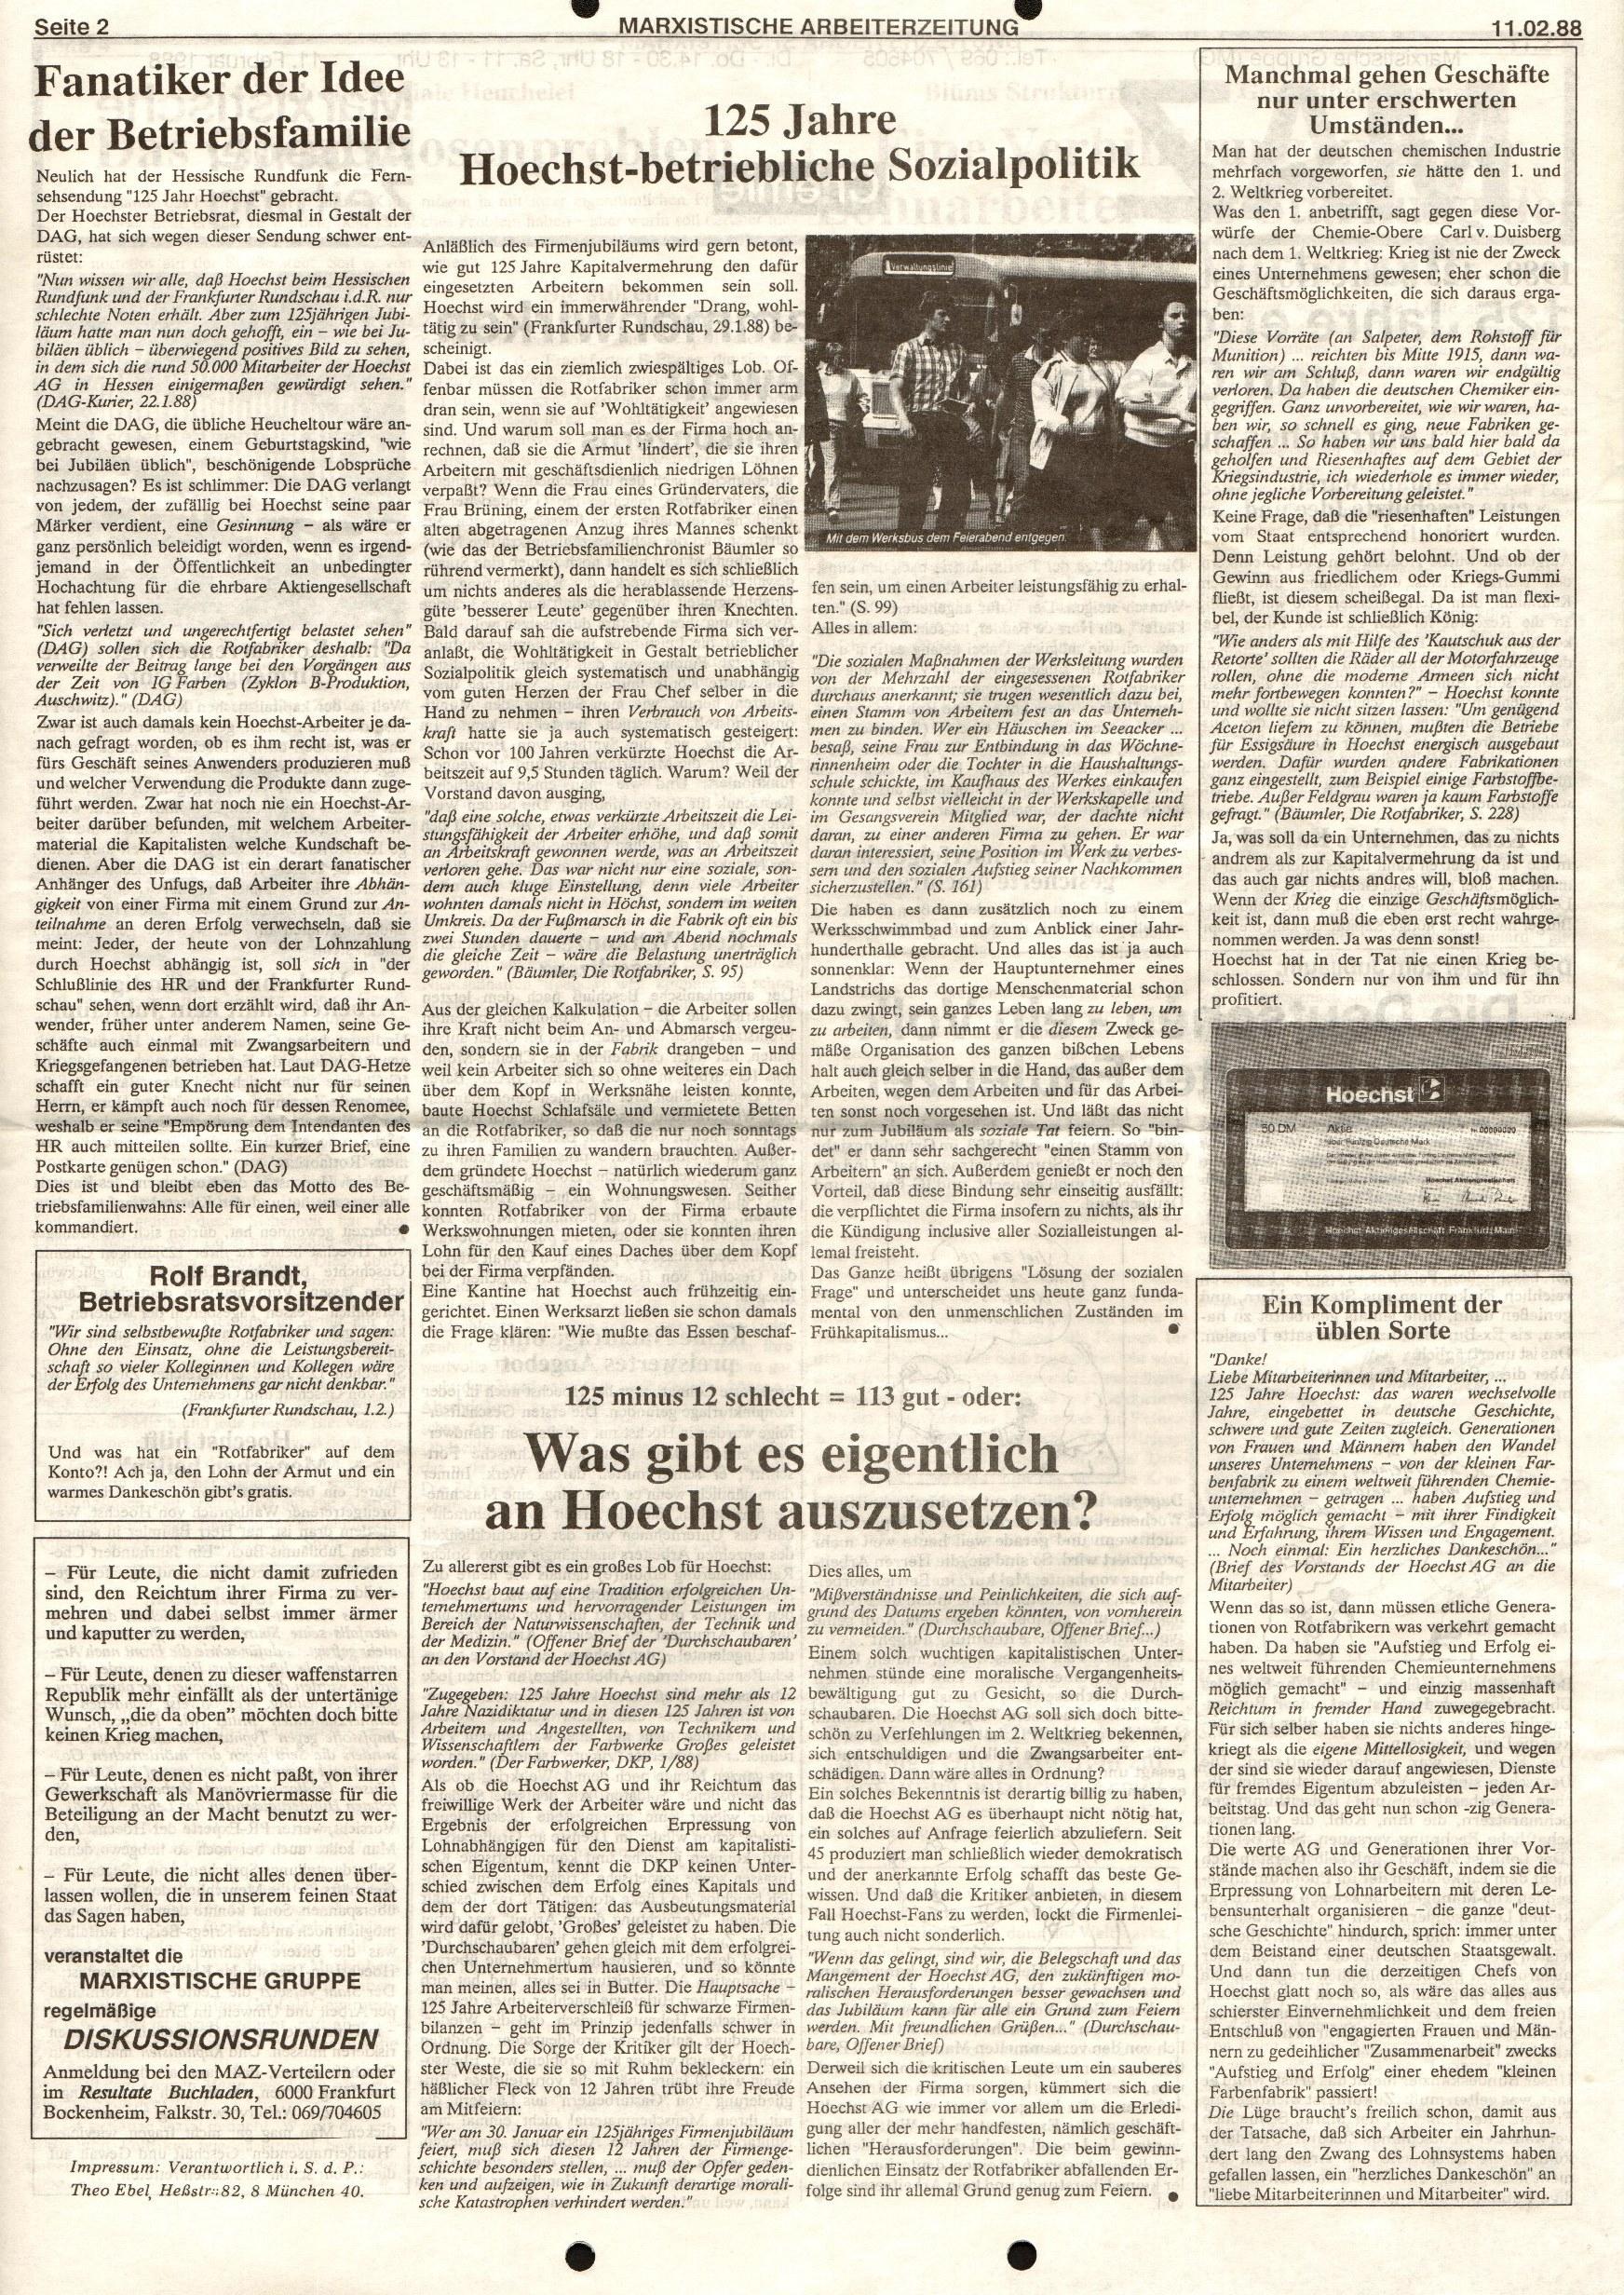 Frankfurt_CPK_Hoechst_MAZ486